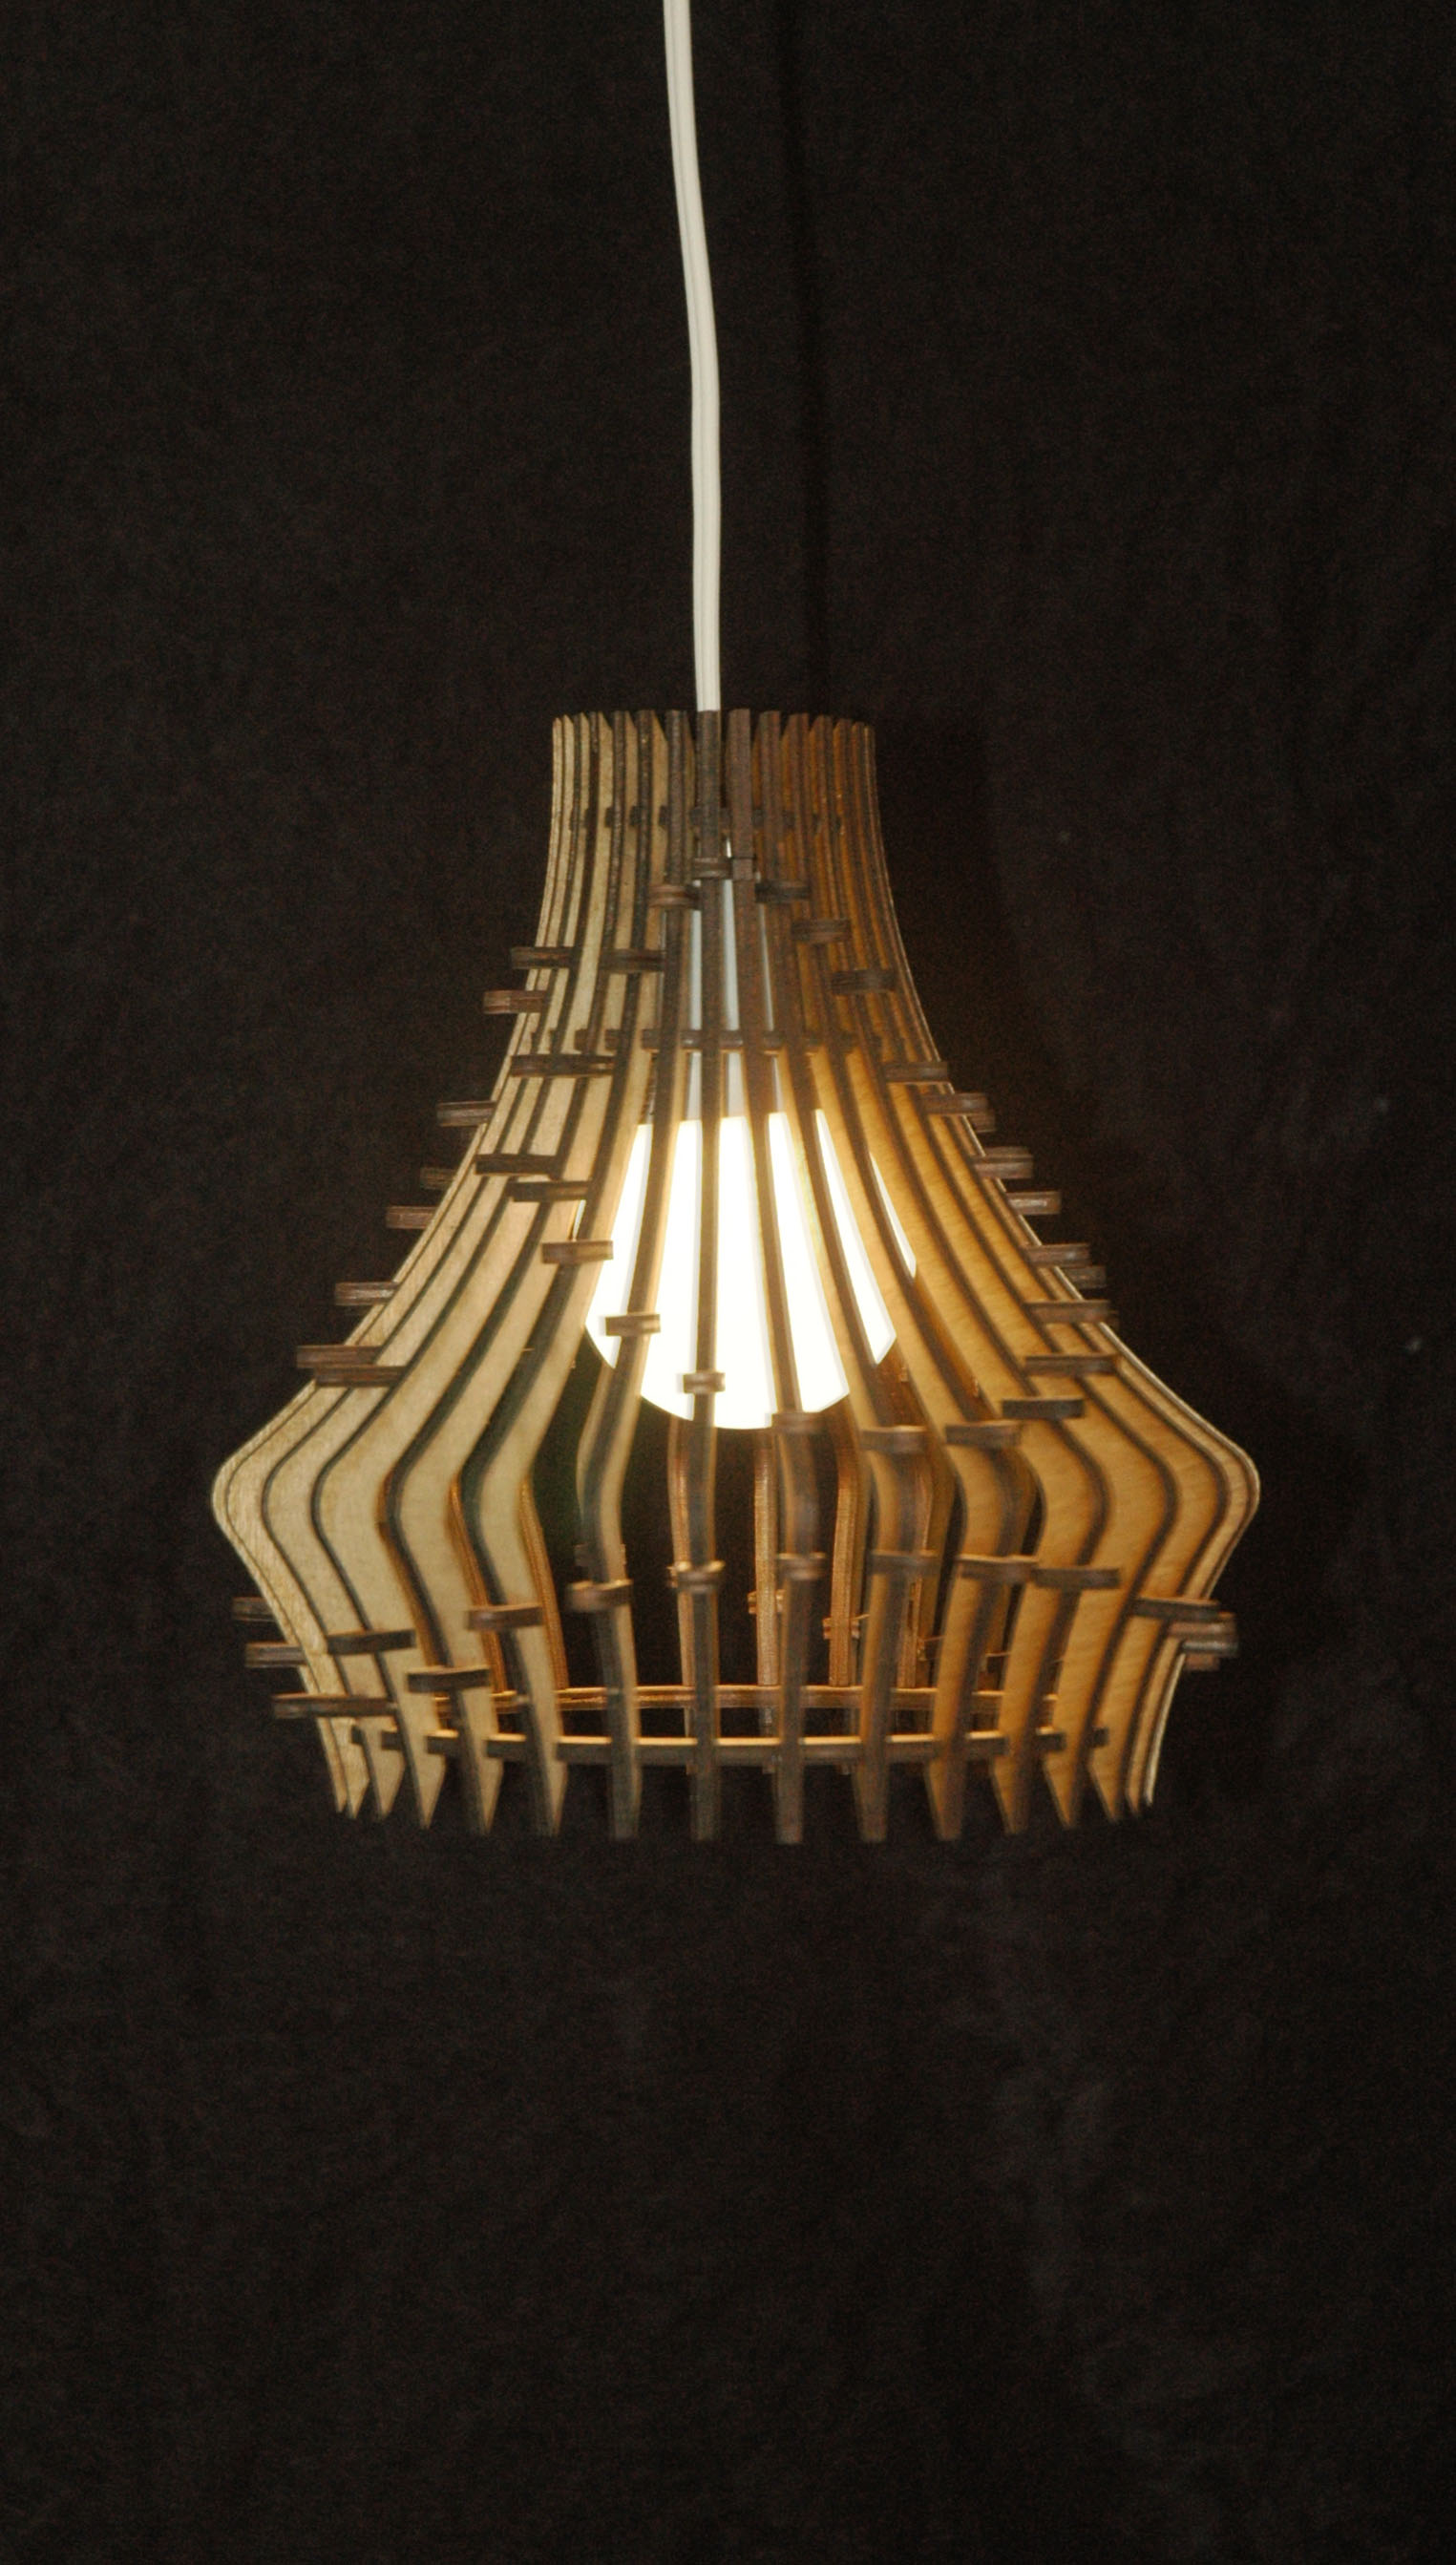 JTR Lamp 1